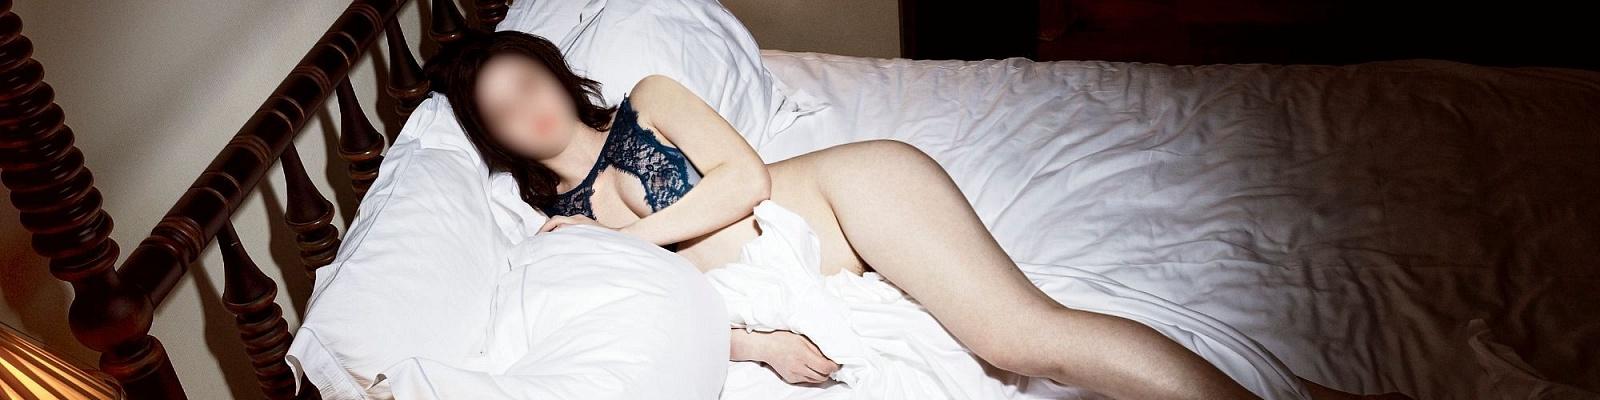 Madeline Montgomery's Cover Photo